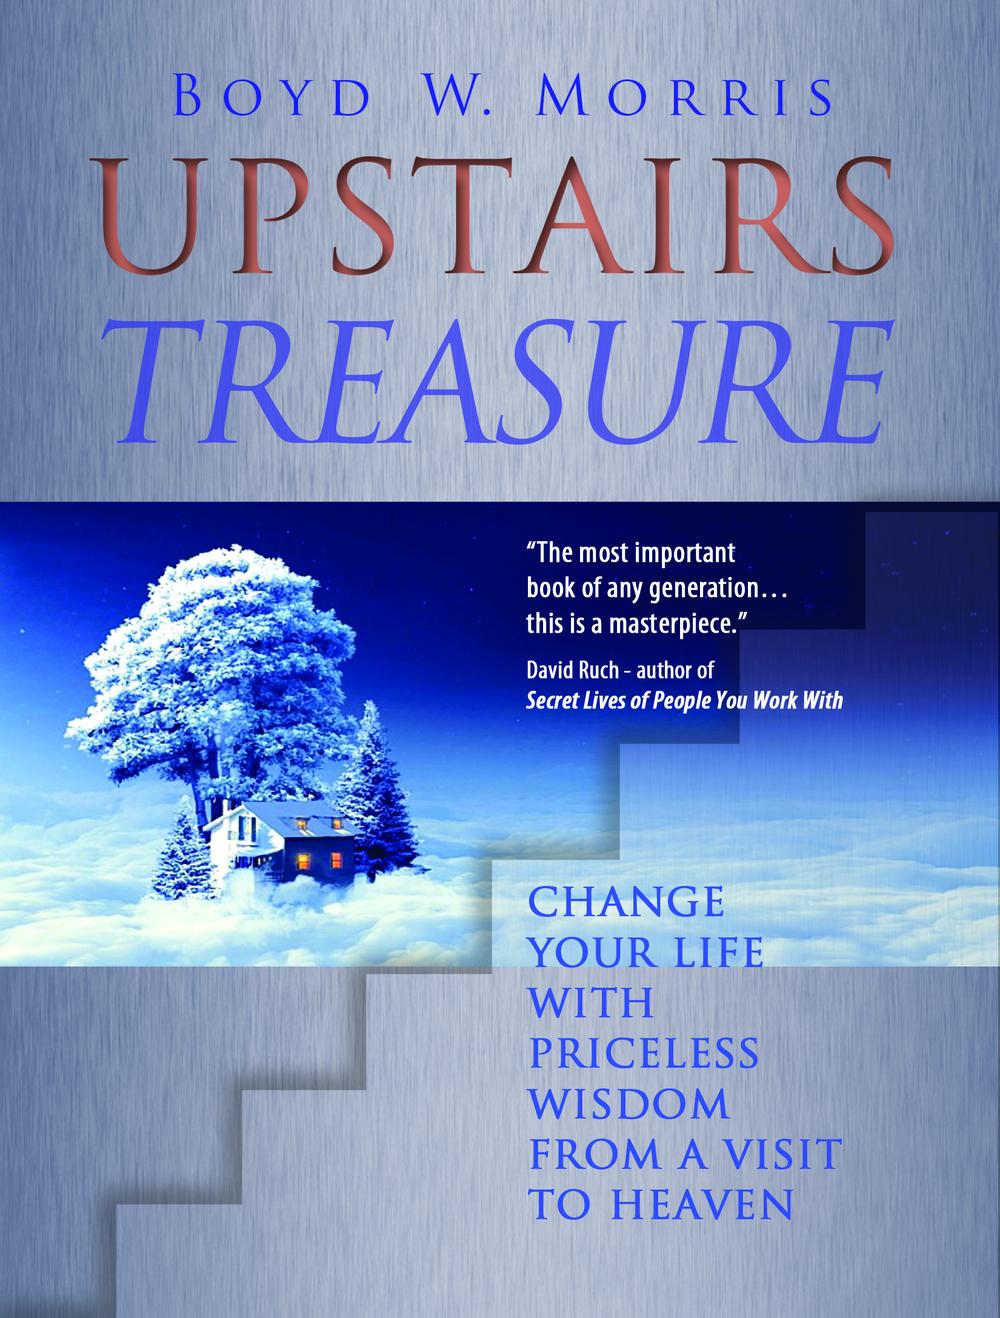 UPSTAIRS Treasure 1.jpg